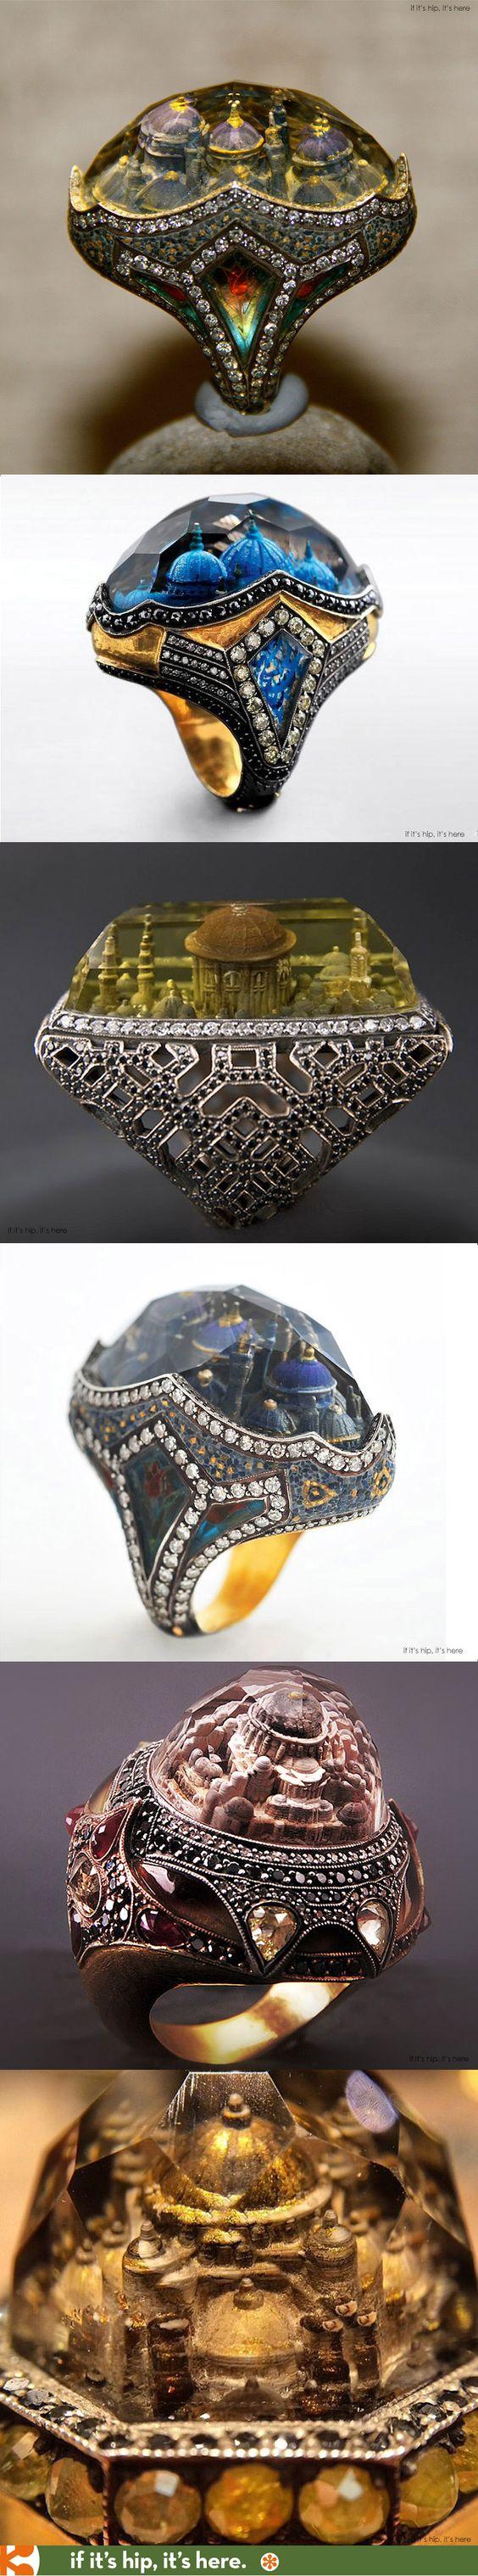 ~Incredible Istanbul Mosque Rings By Turkish Jeweler Sevan Biçakçi   House of Beccaria